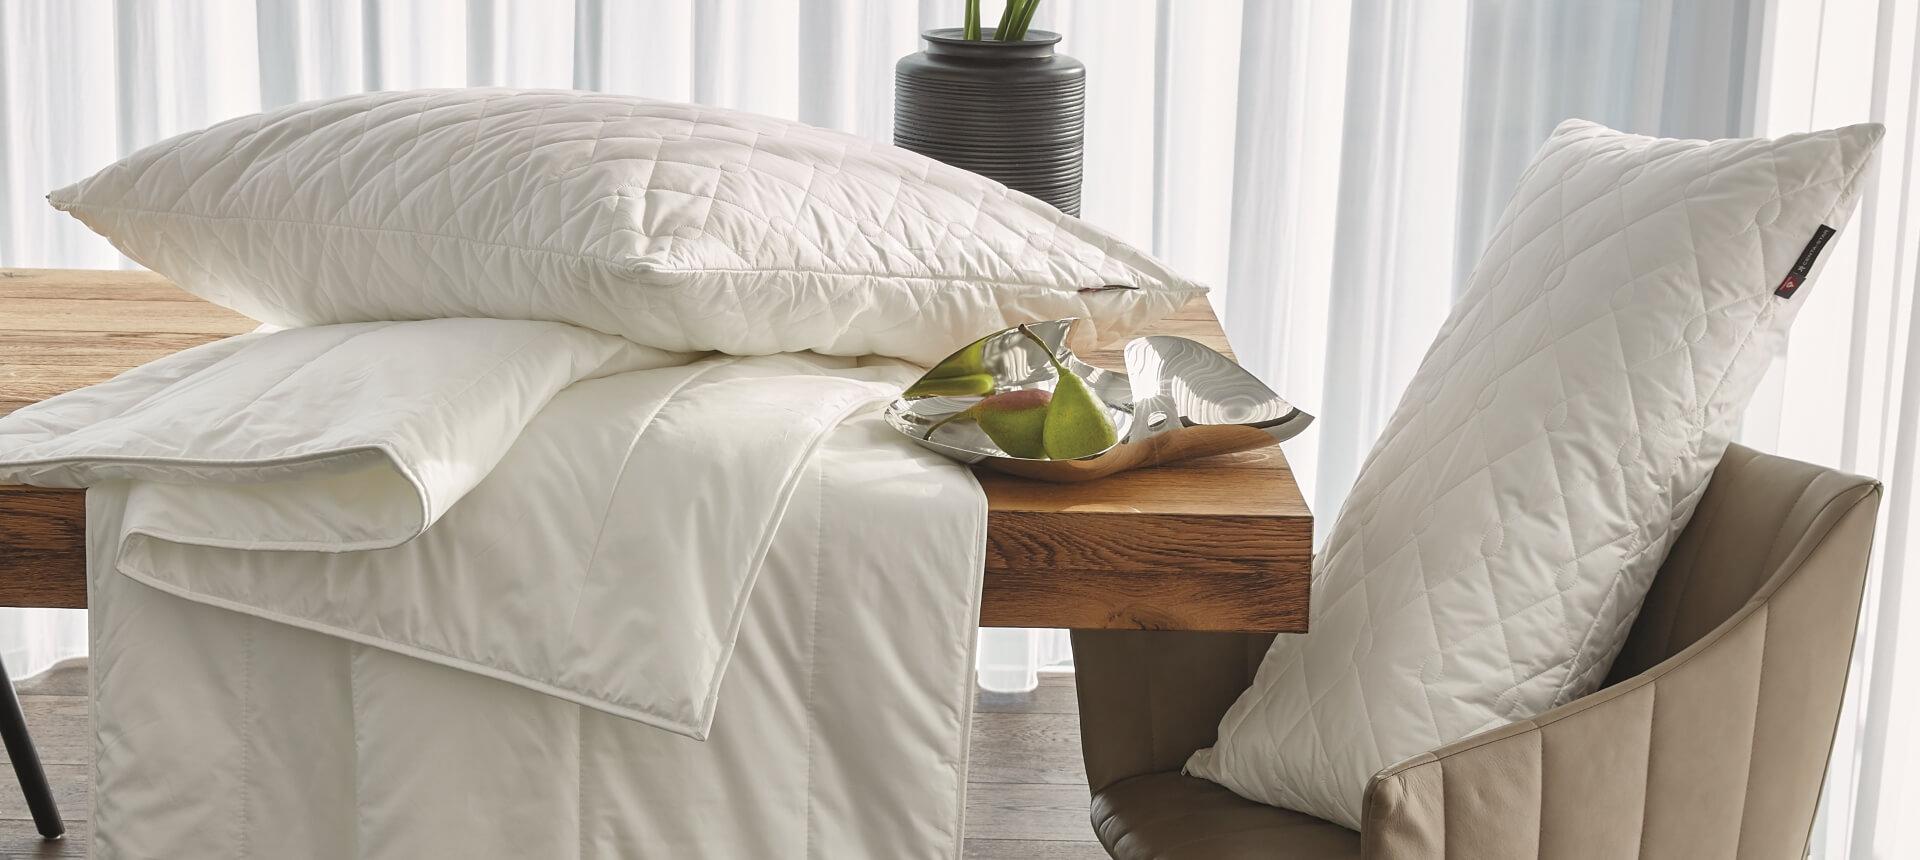 Centa-Star Royal - die atmungsaktive Bettdecke